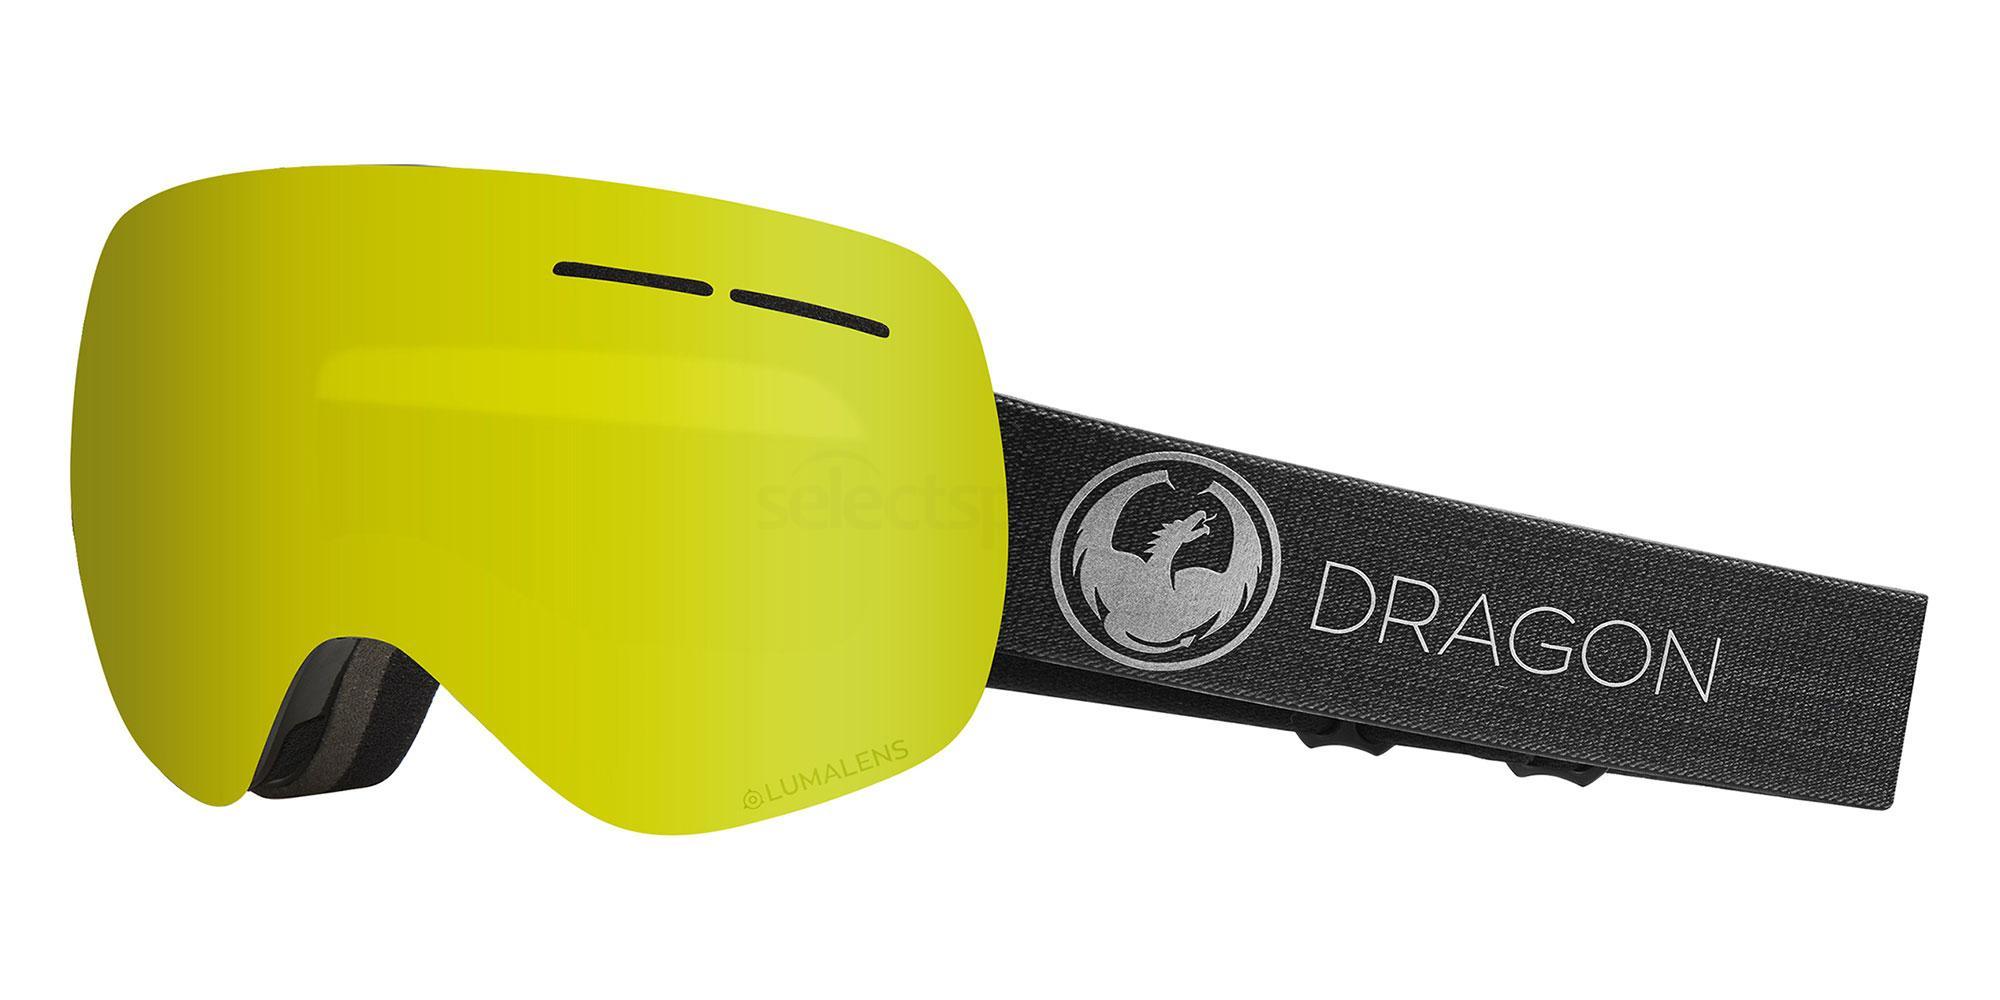 338 DR X1S NEW PH Goggles, Dragon